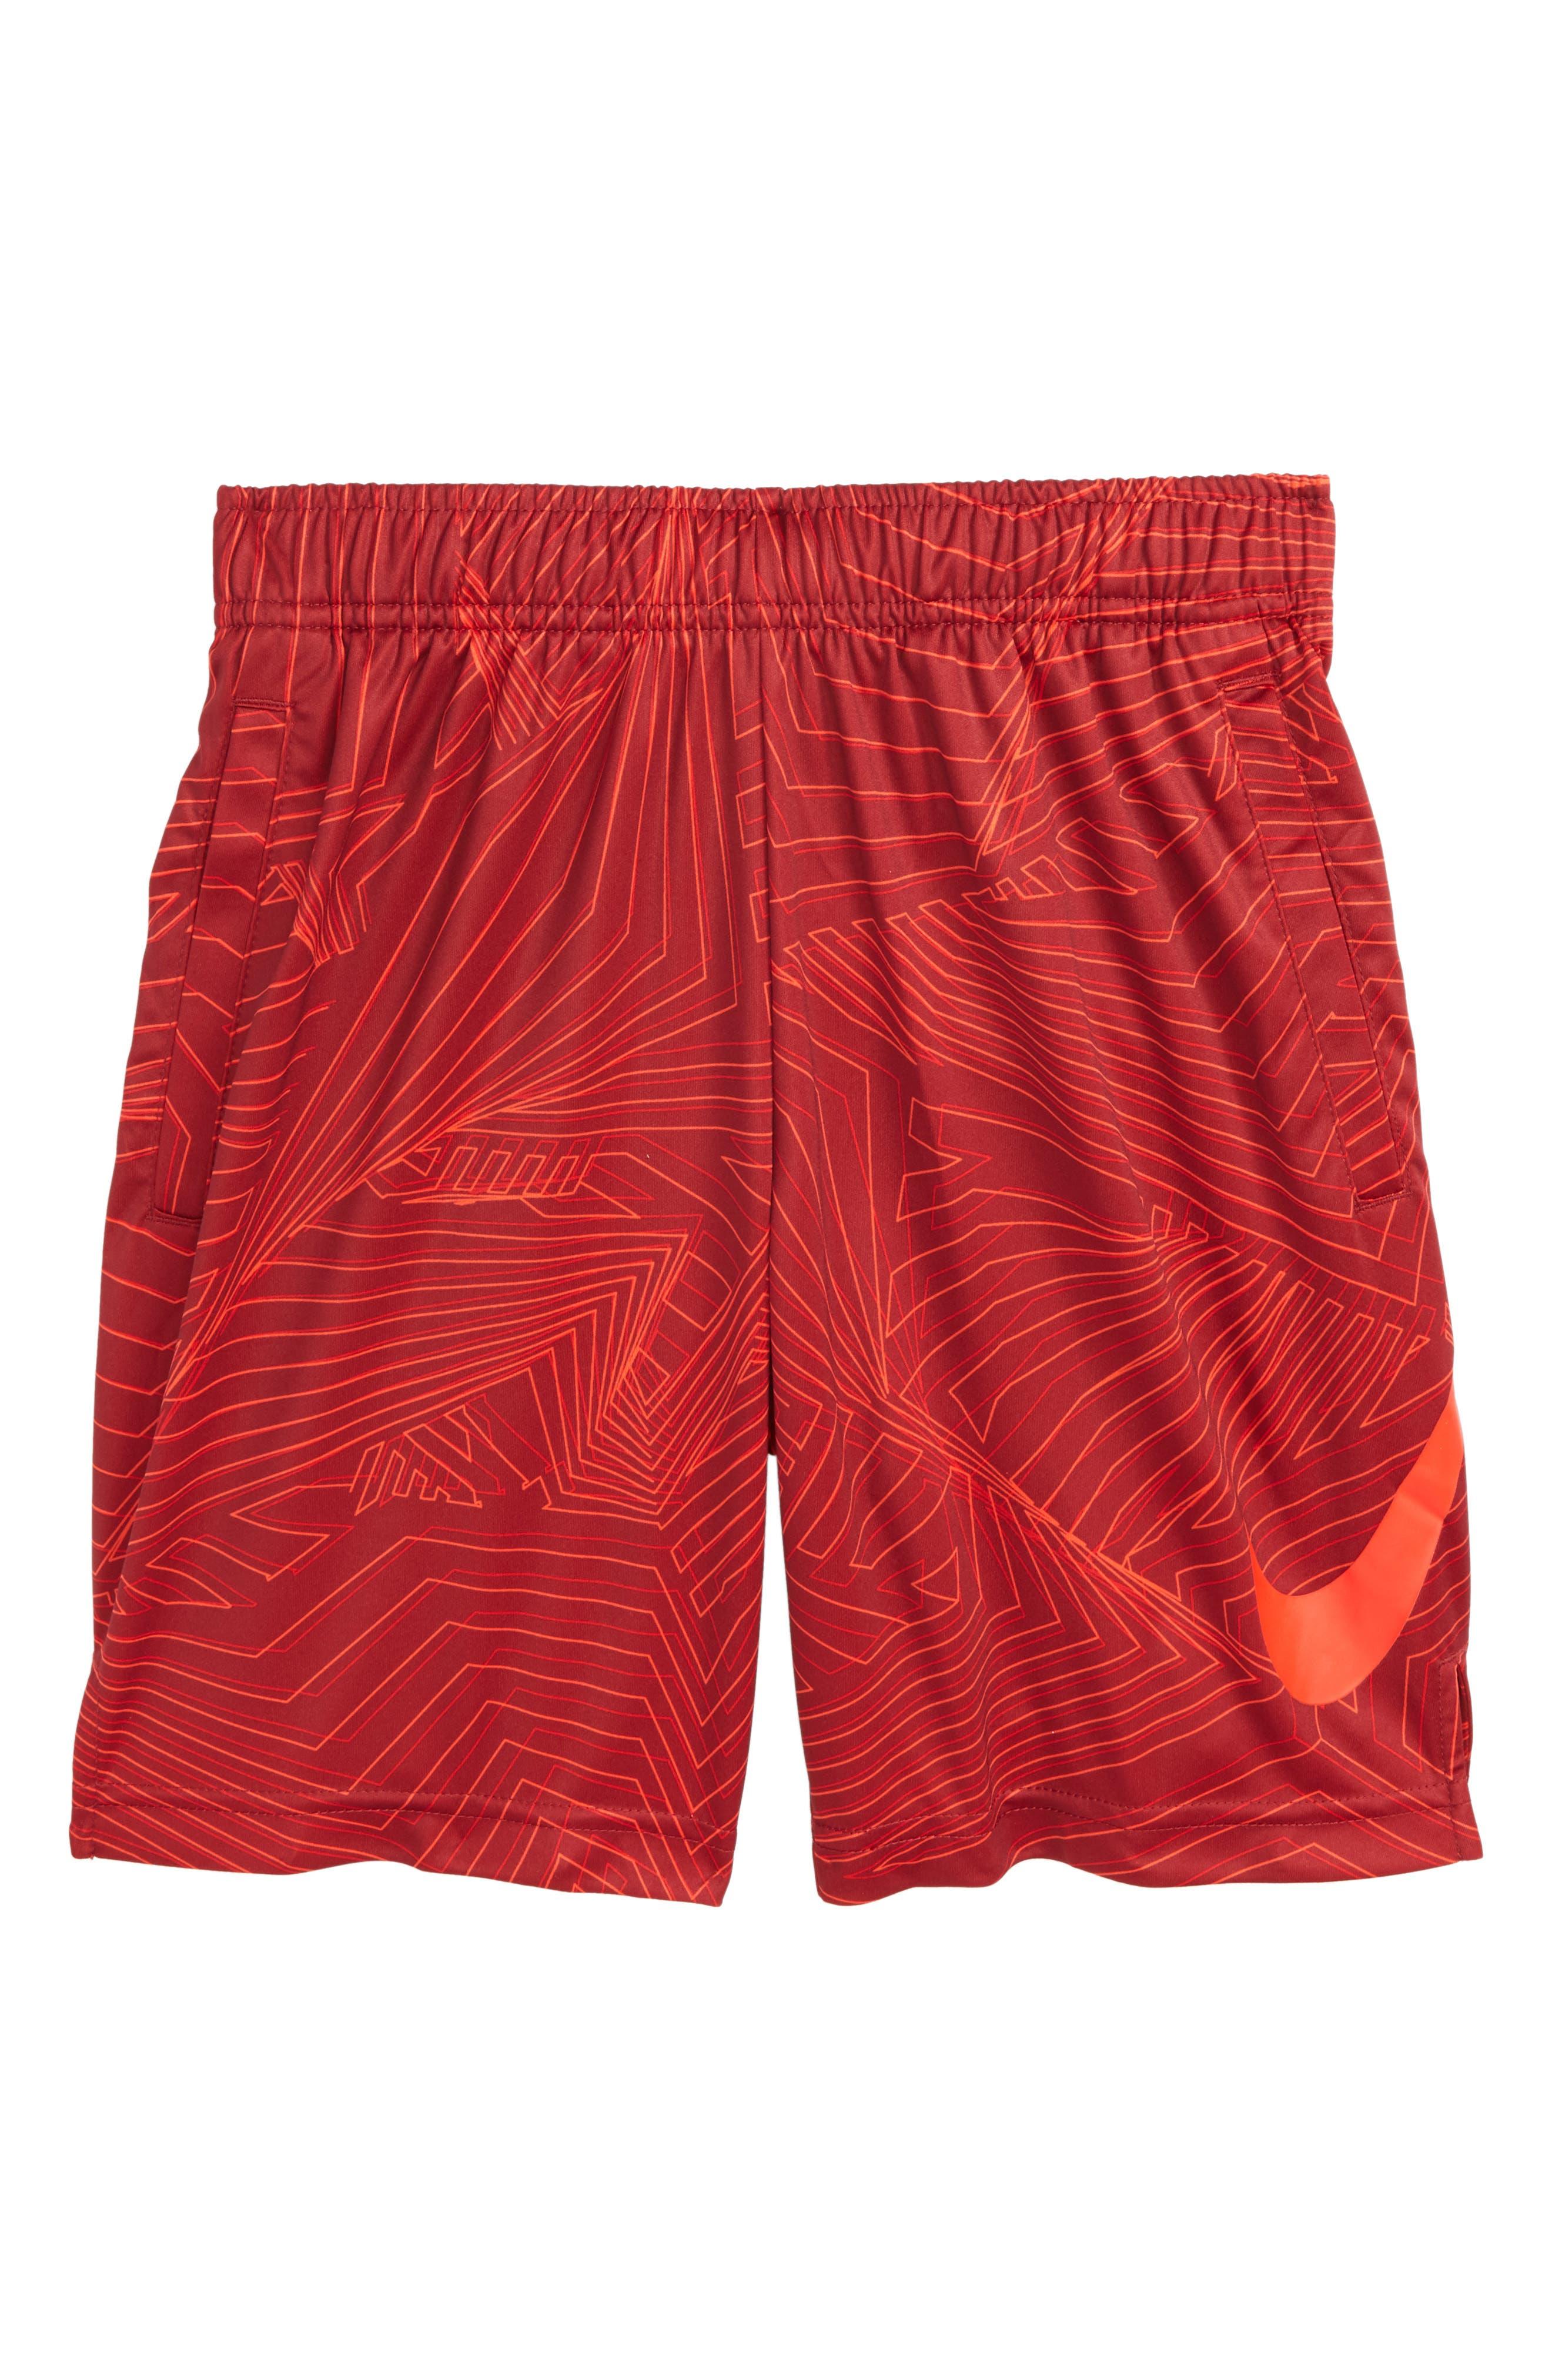 Dry Training Shorts,                             Main thumbnail 5, color,